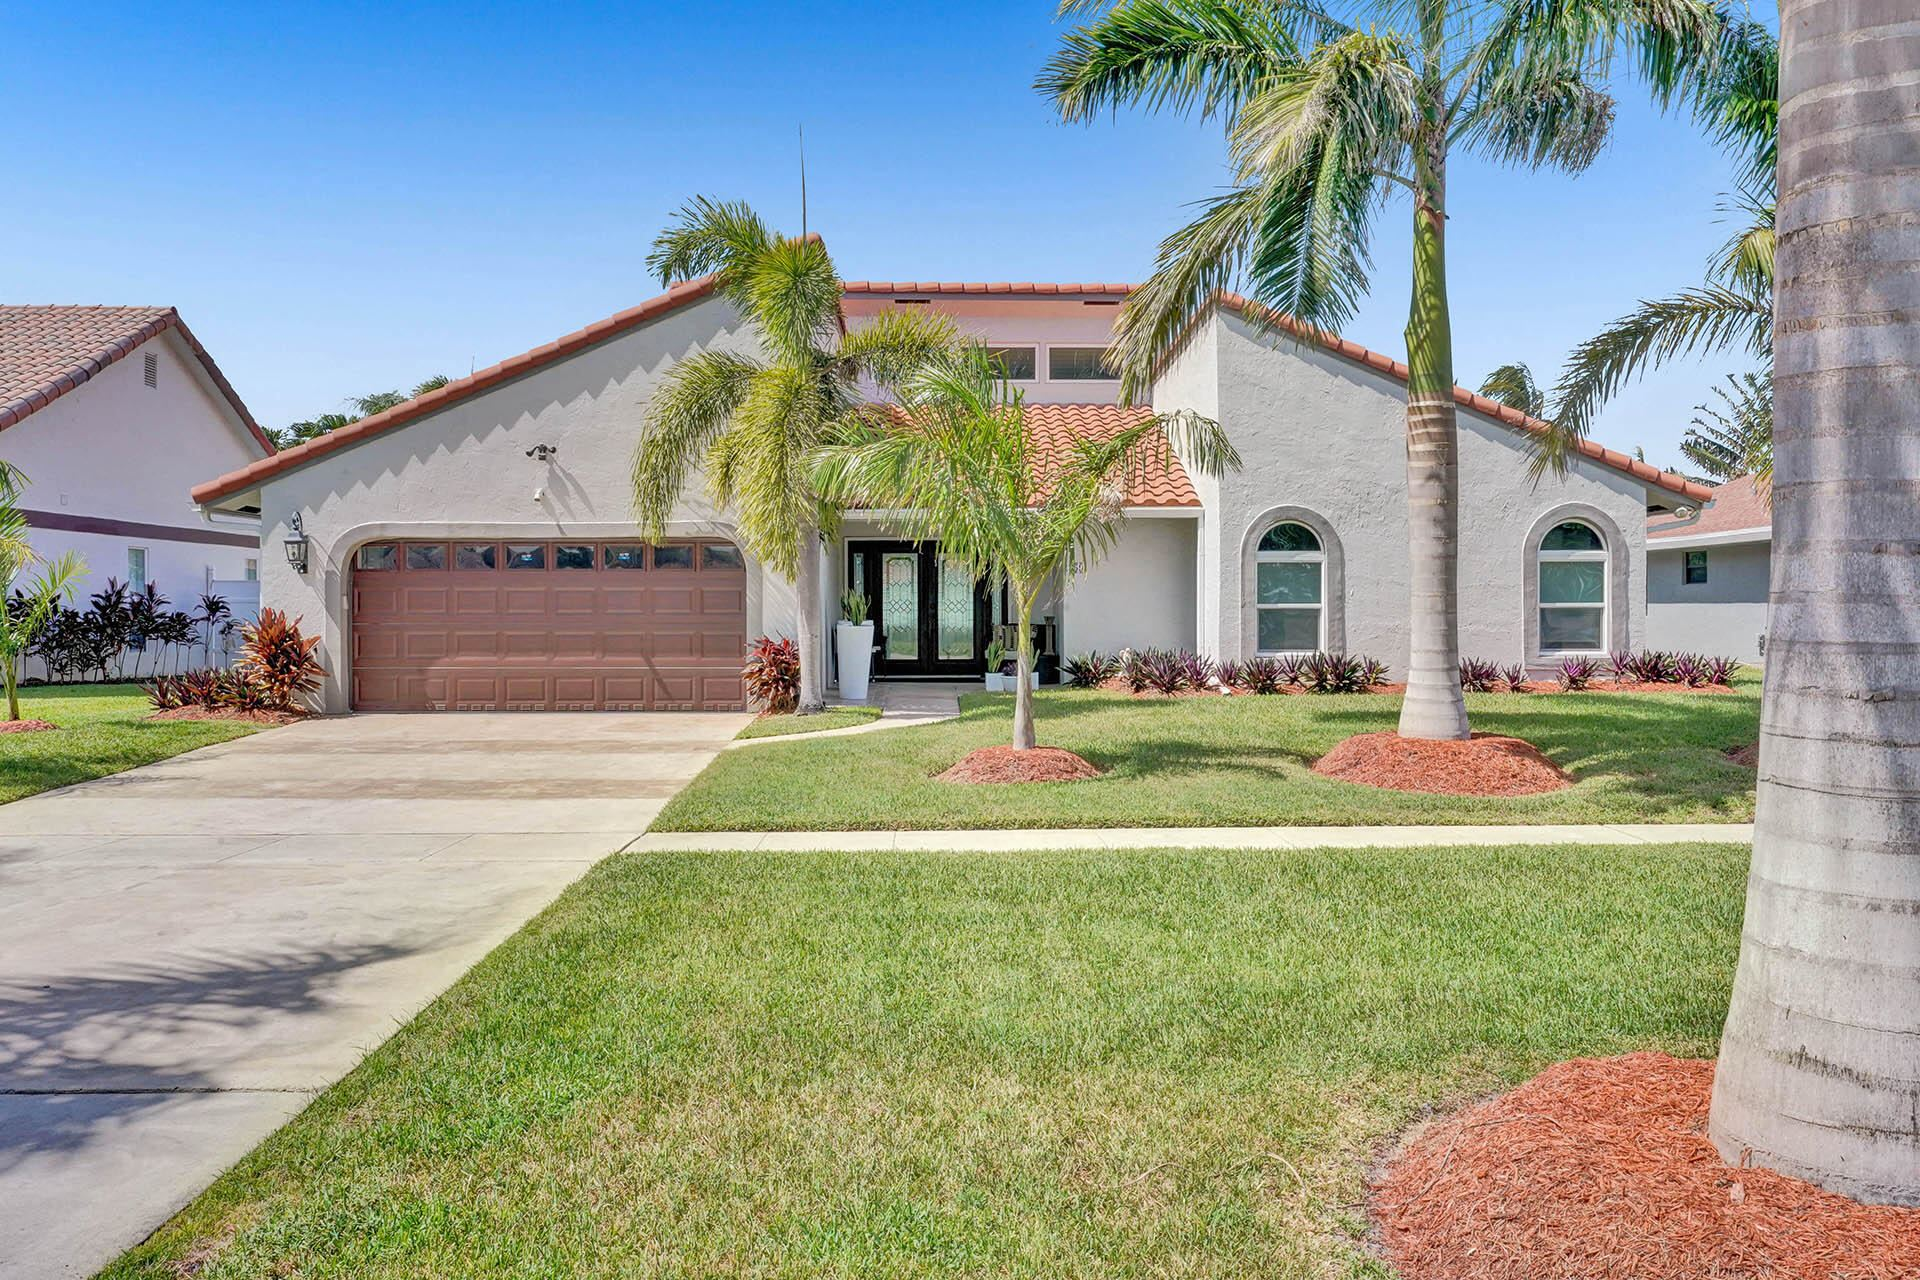 359 S Country Club Boulevard, Boca Raton, FL 33487 - #: RX-10741988